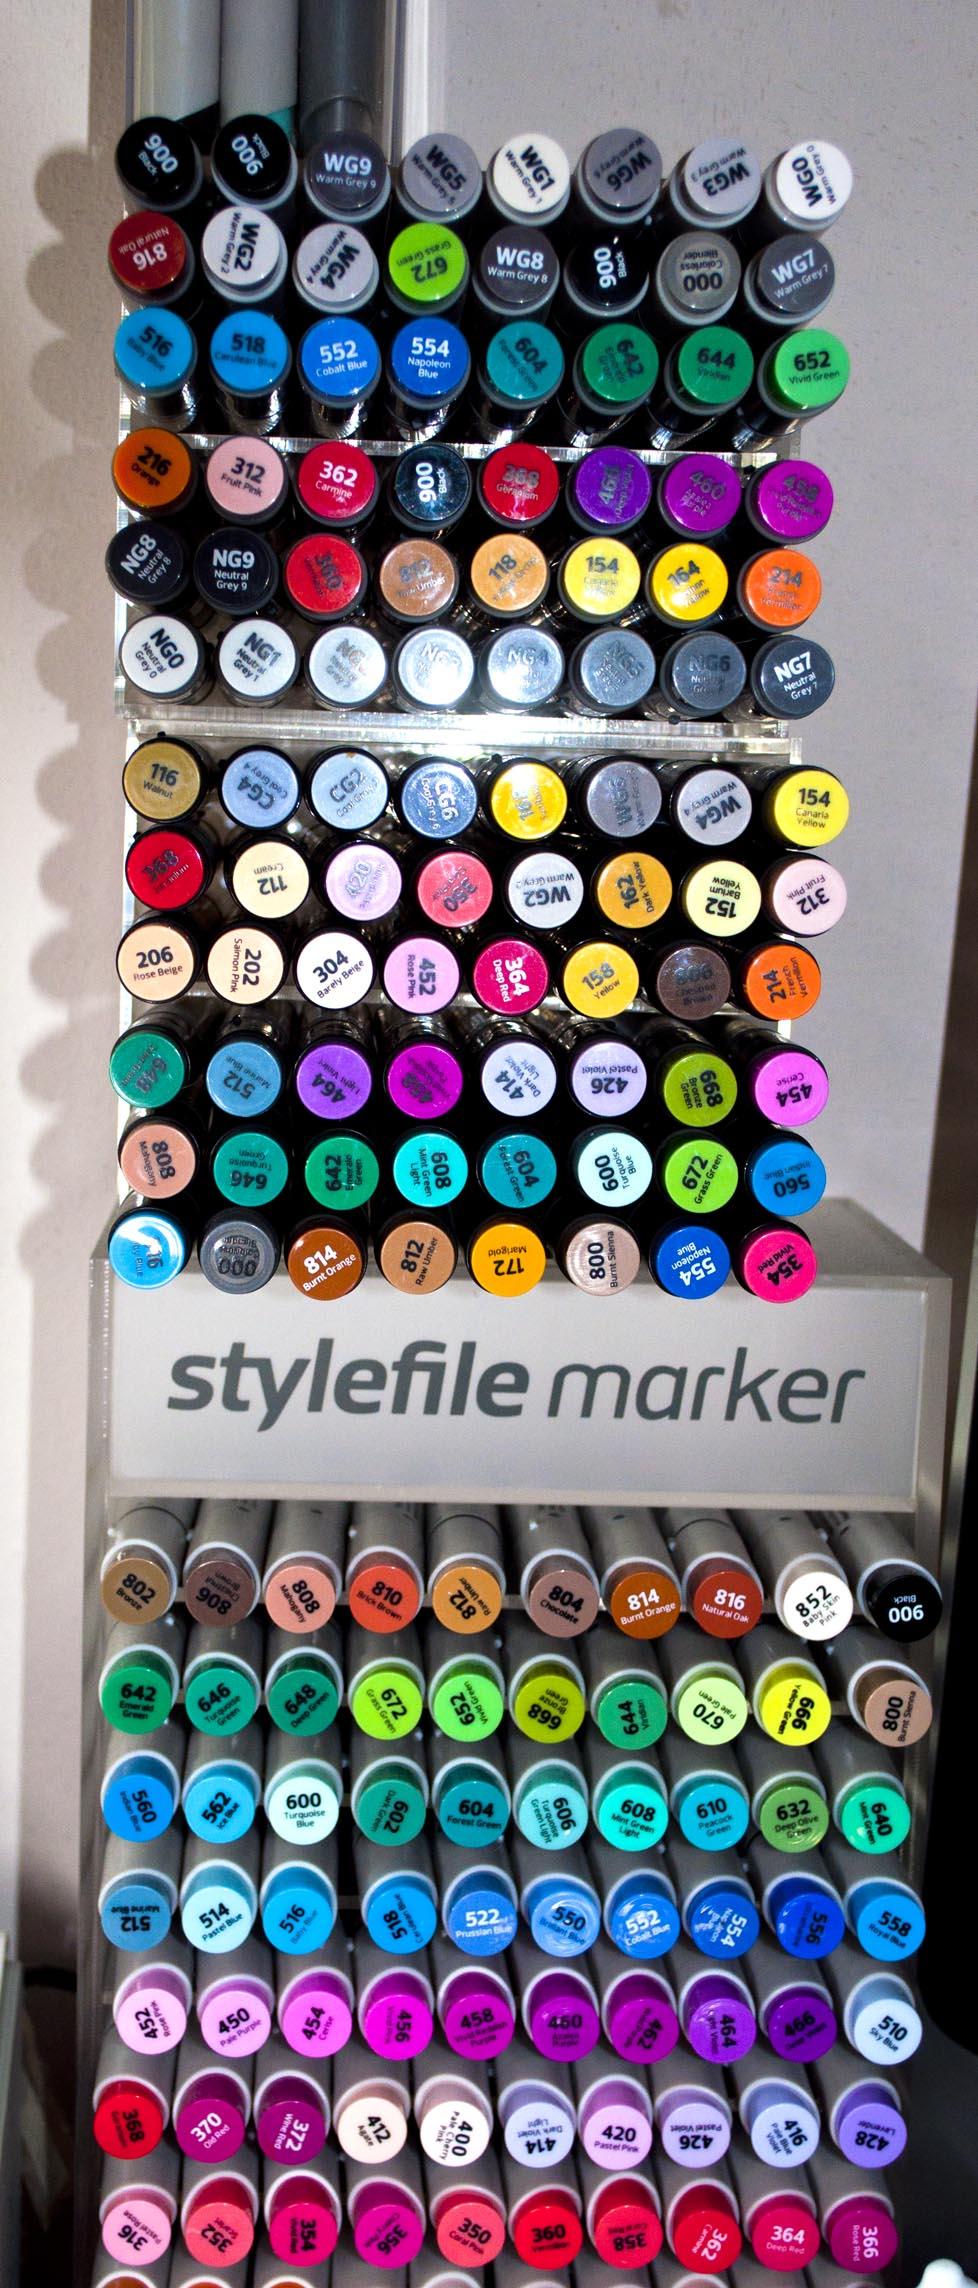 Stylefile Markers.jpg